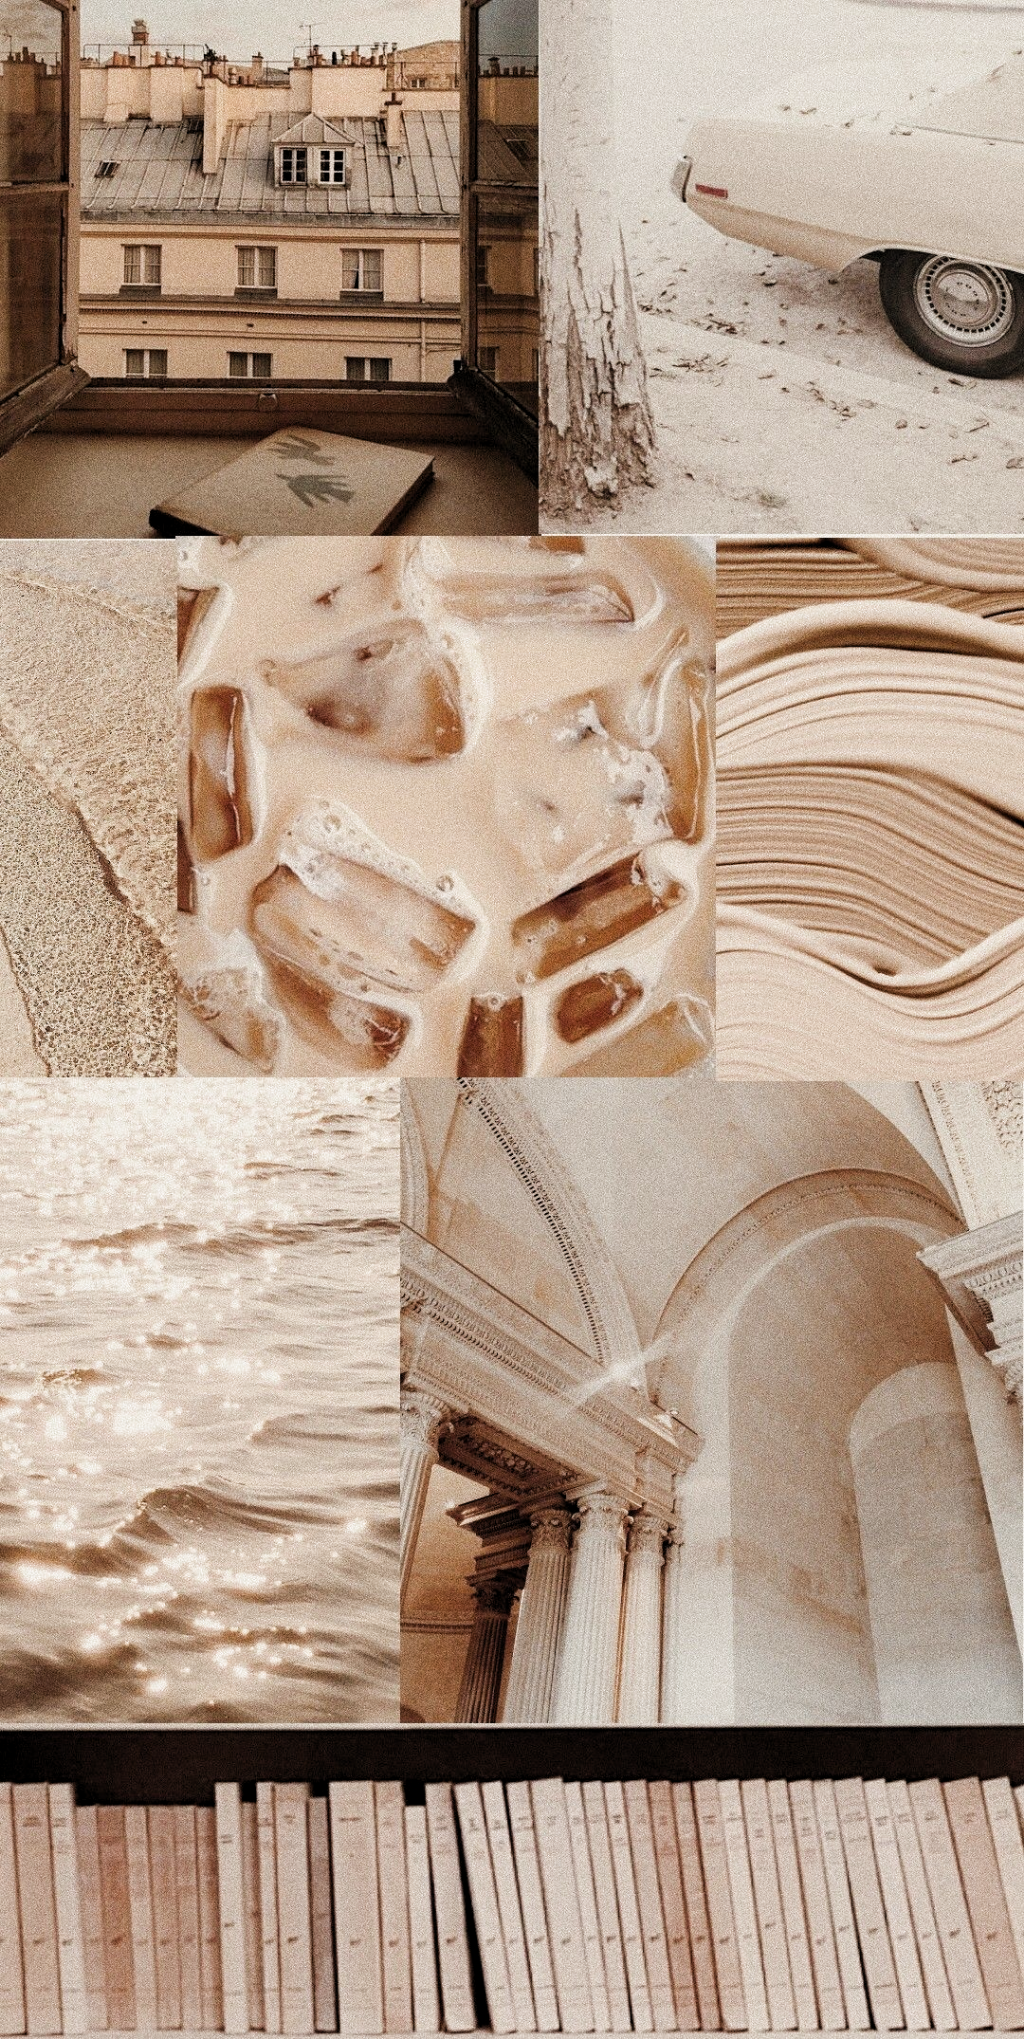 Beige Aesthetic Wallpaper In 2020 Aesthetic Pastel Wallpaper Aesthetic Wallpapers Beige Aesthetic